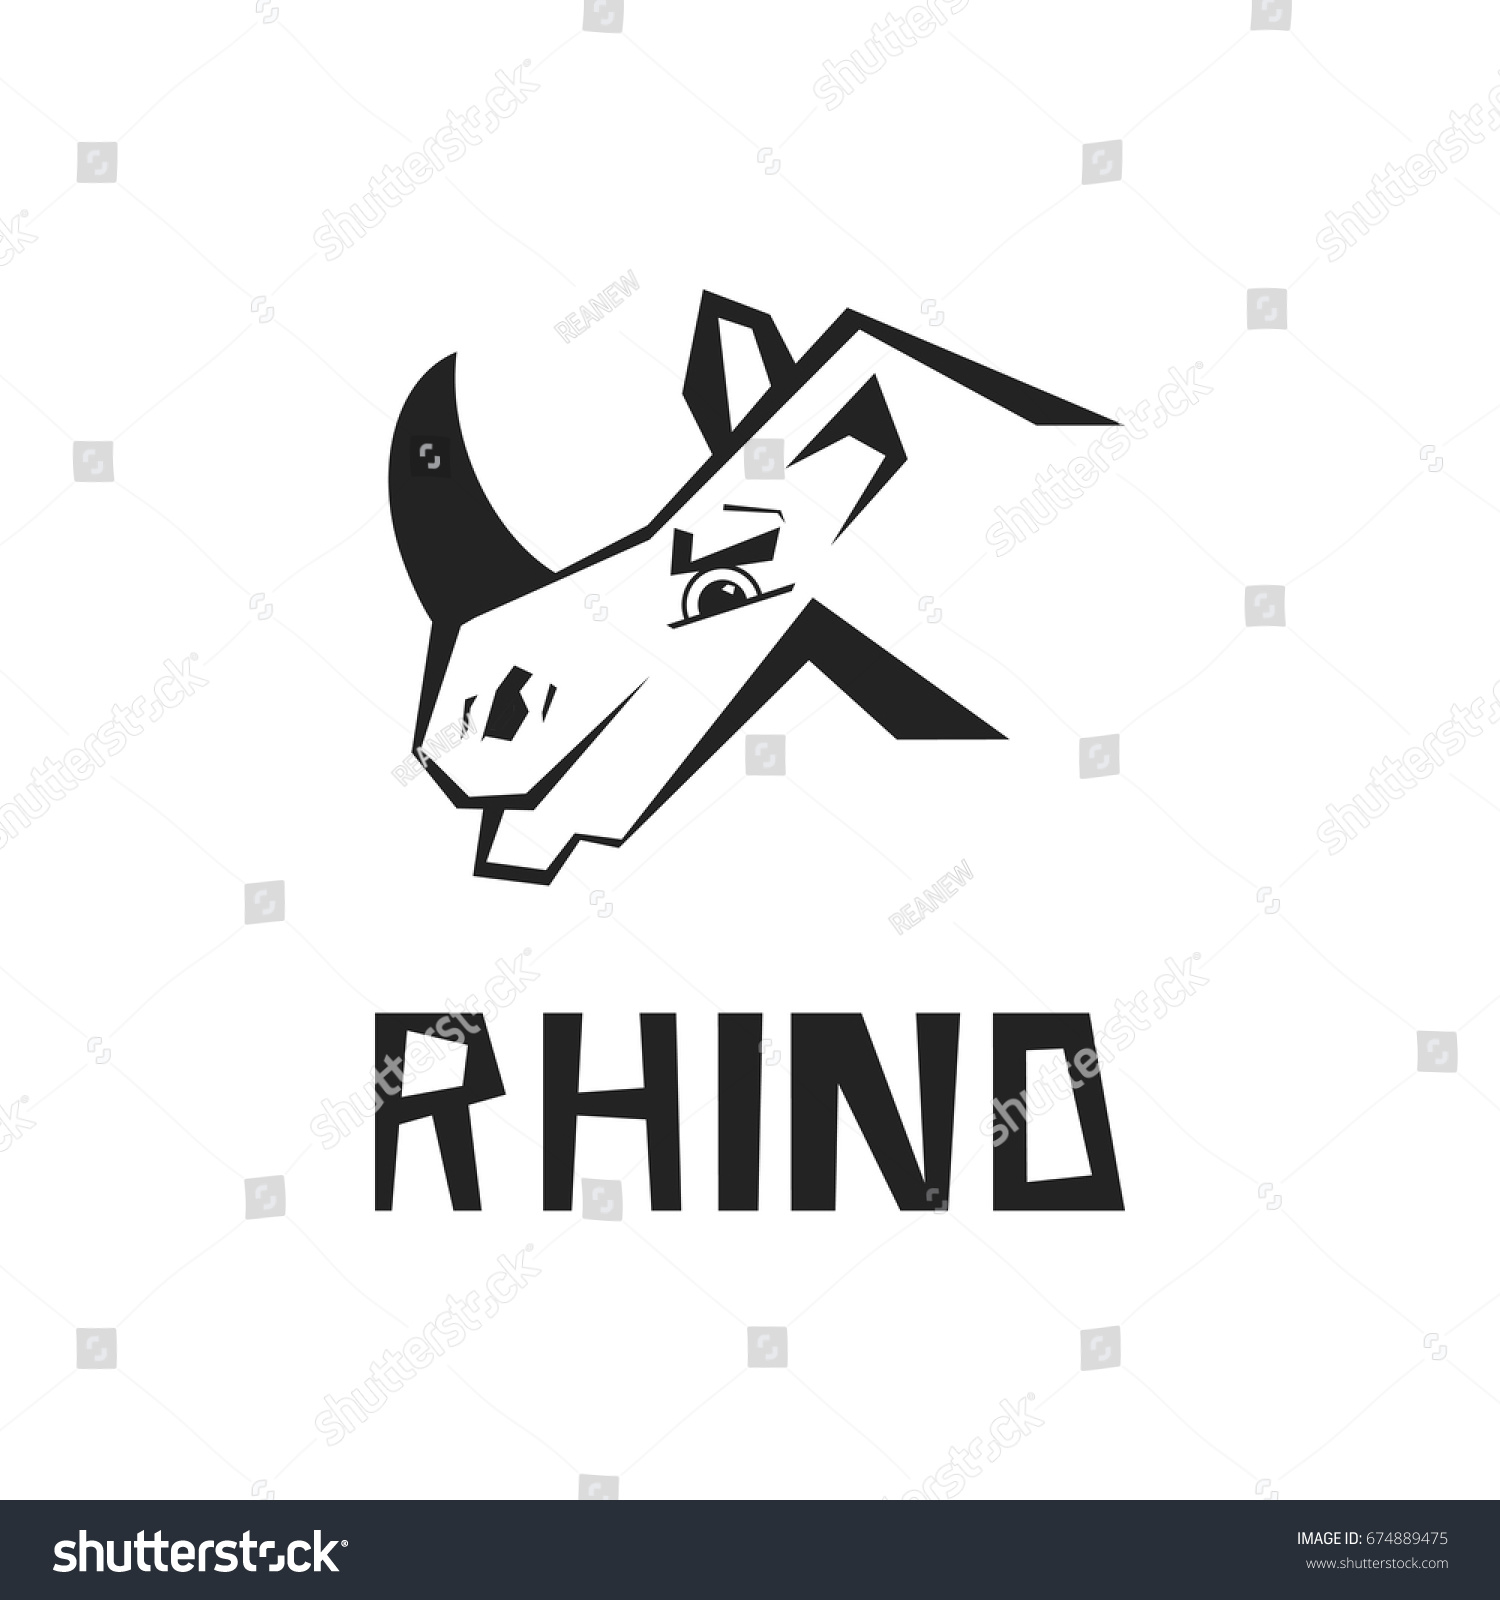 rhinoceros rhino logo business template rhinos stock vector royalty